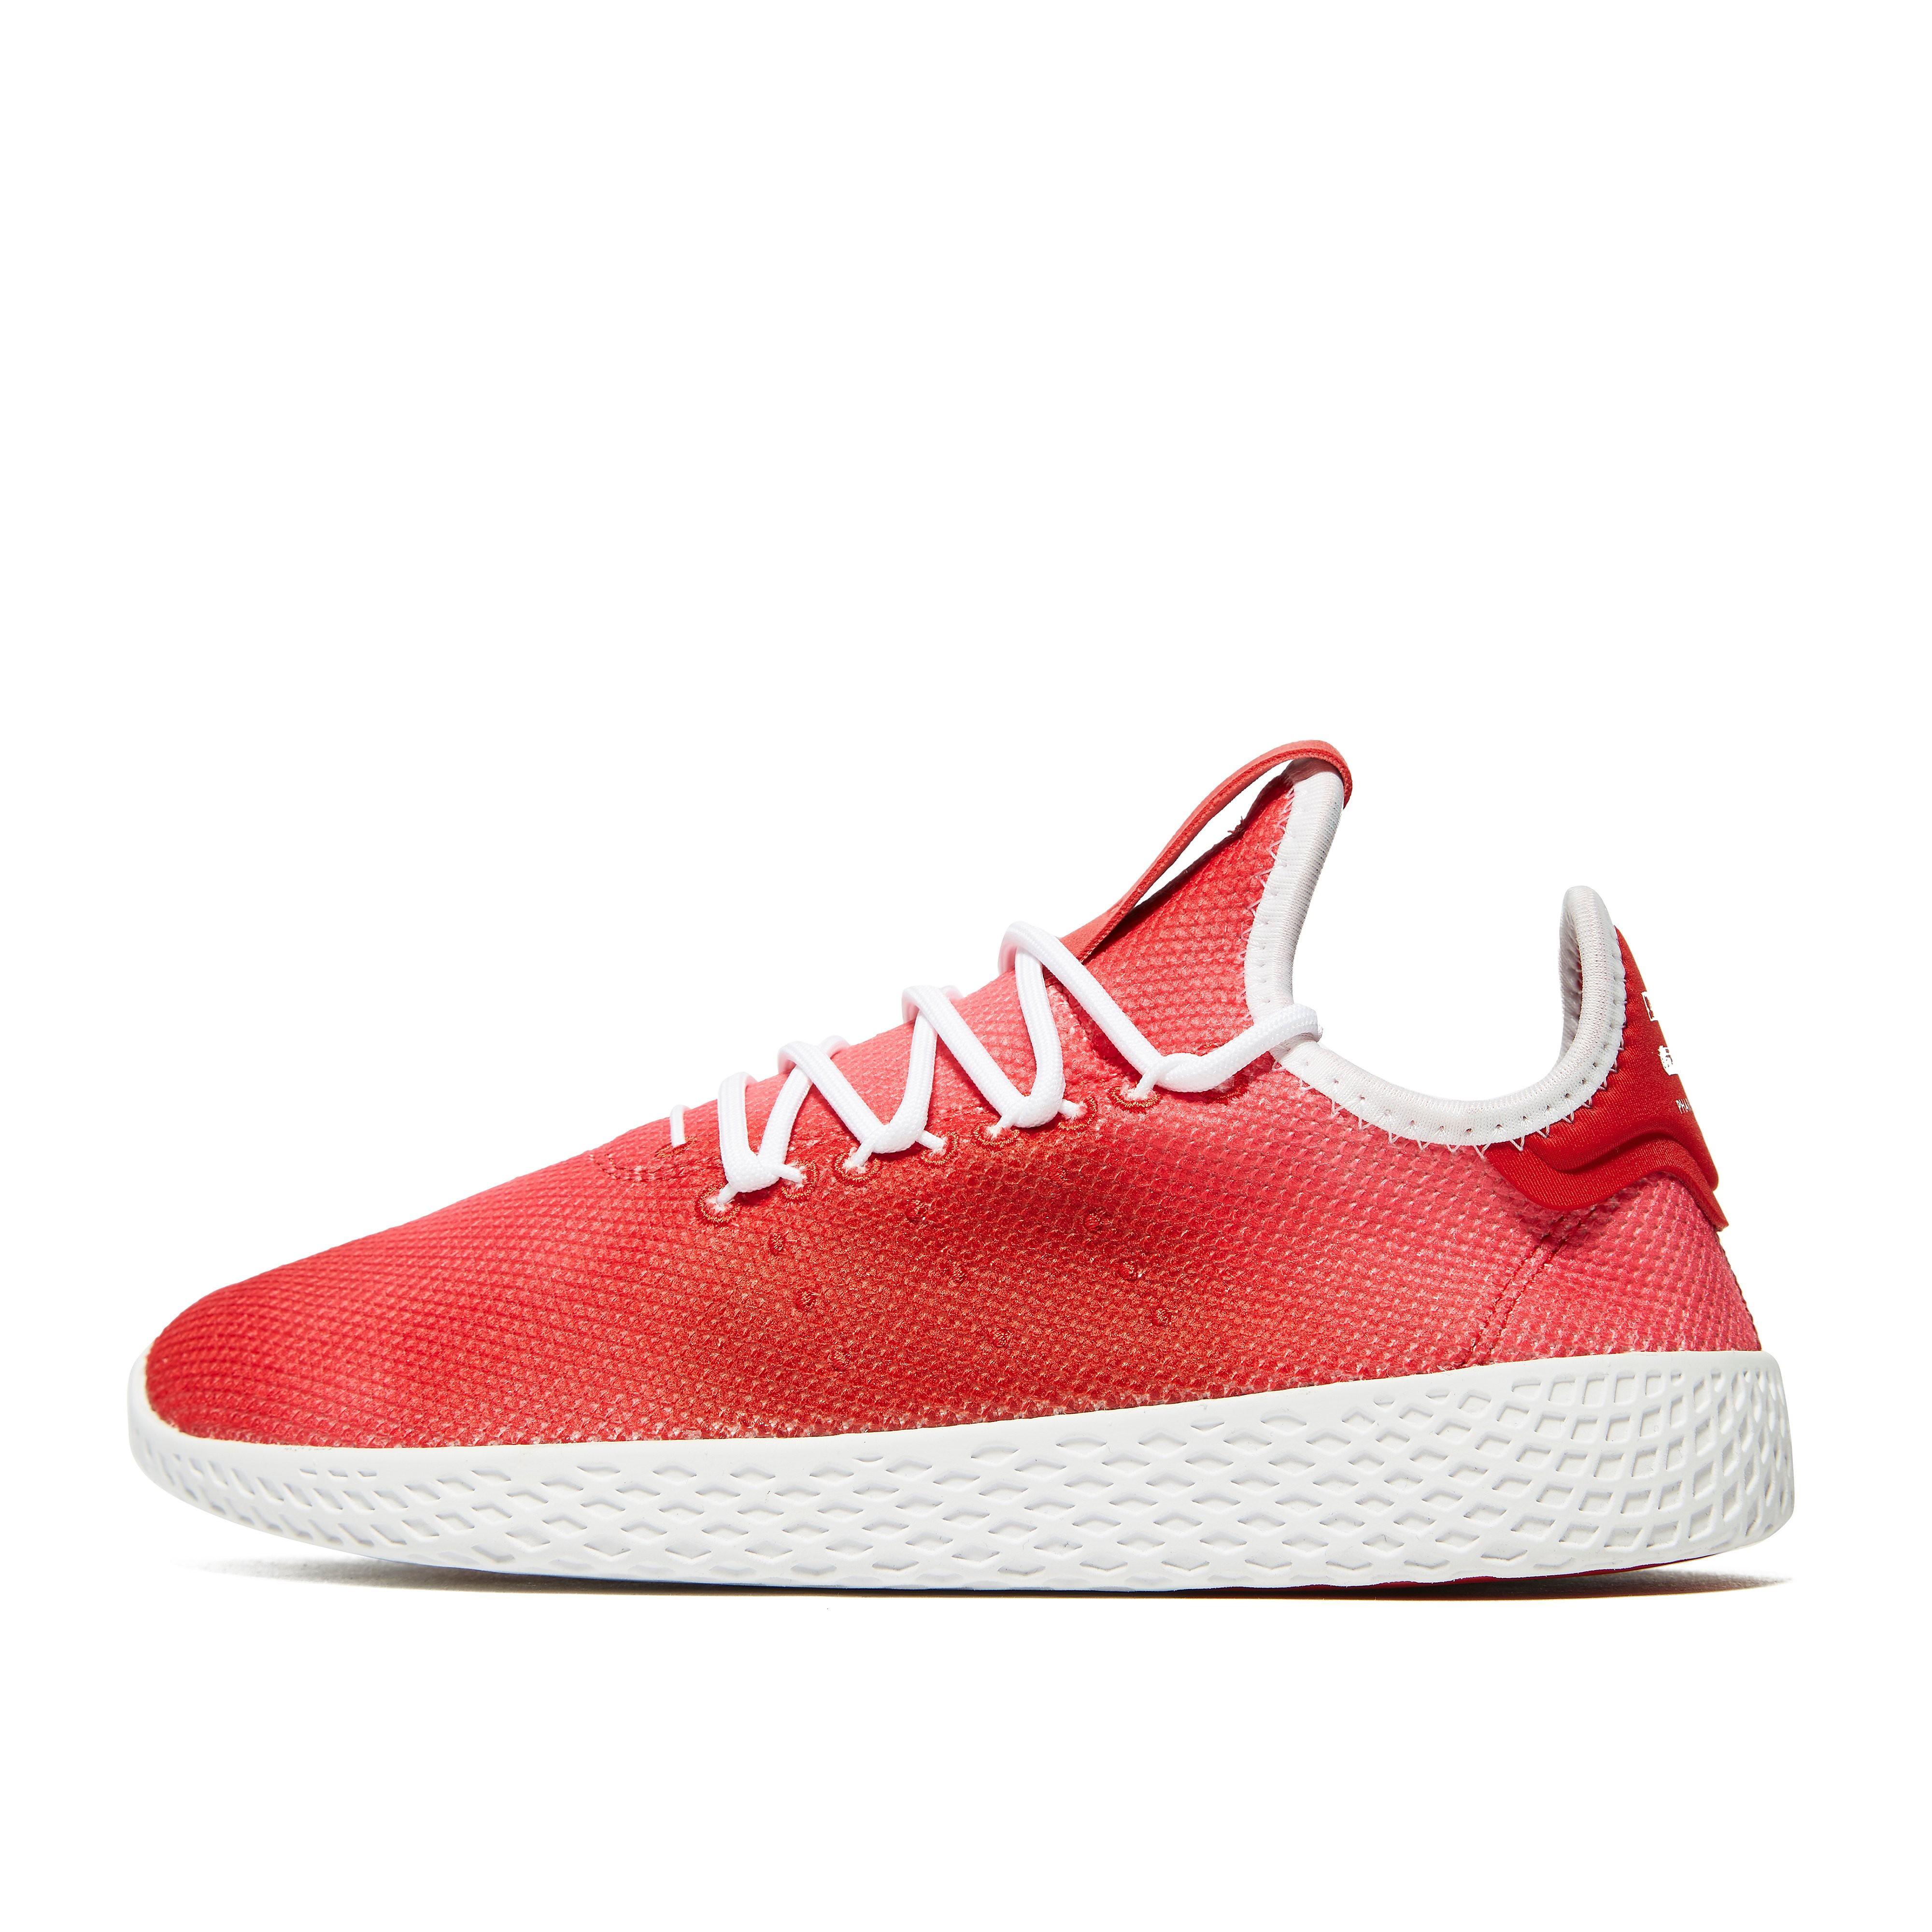 adidas Originals Pharrell Williams Tennis Hu júnior